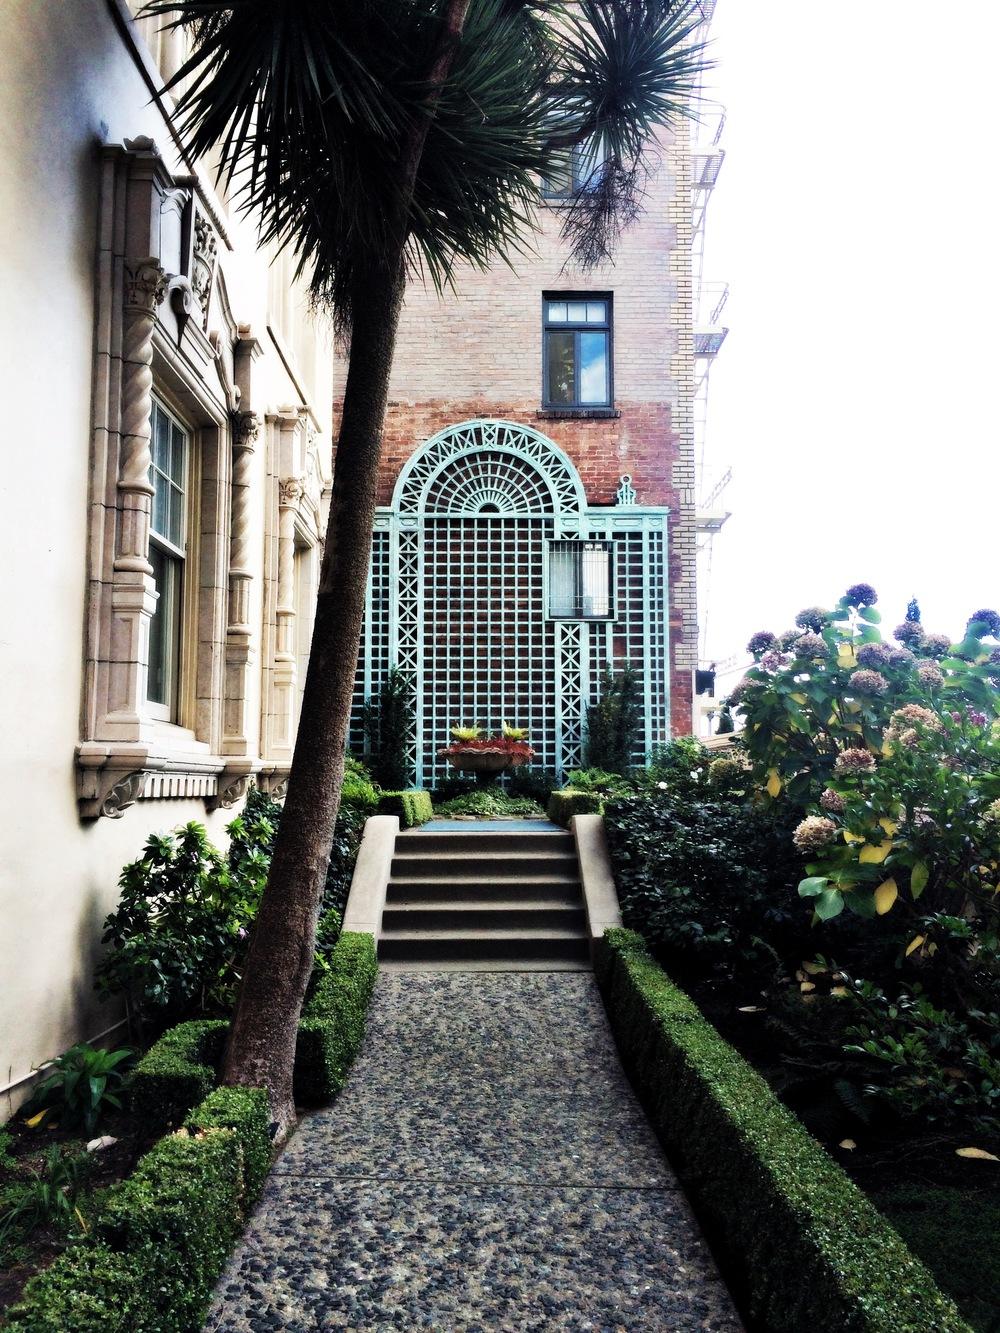 Garden courtyard on Nob Hill